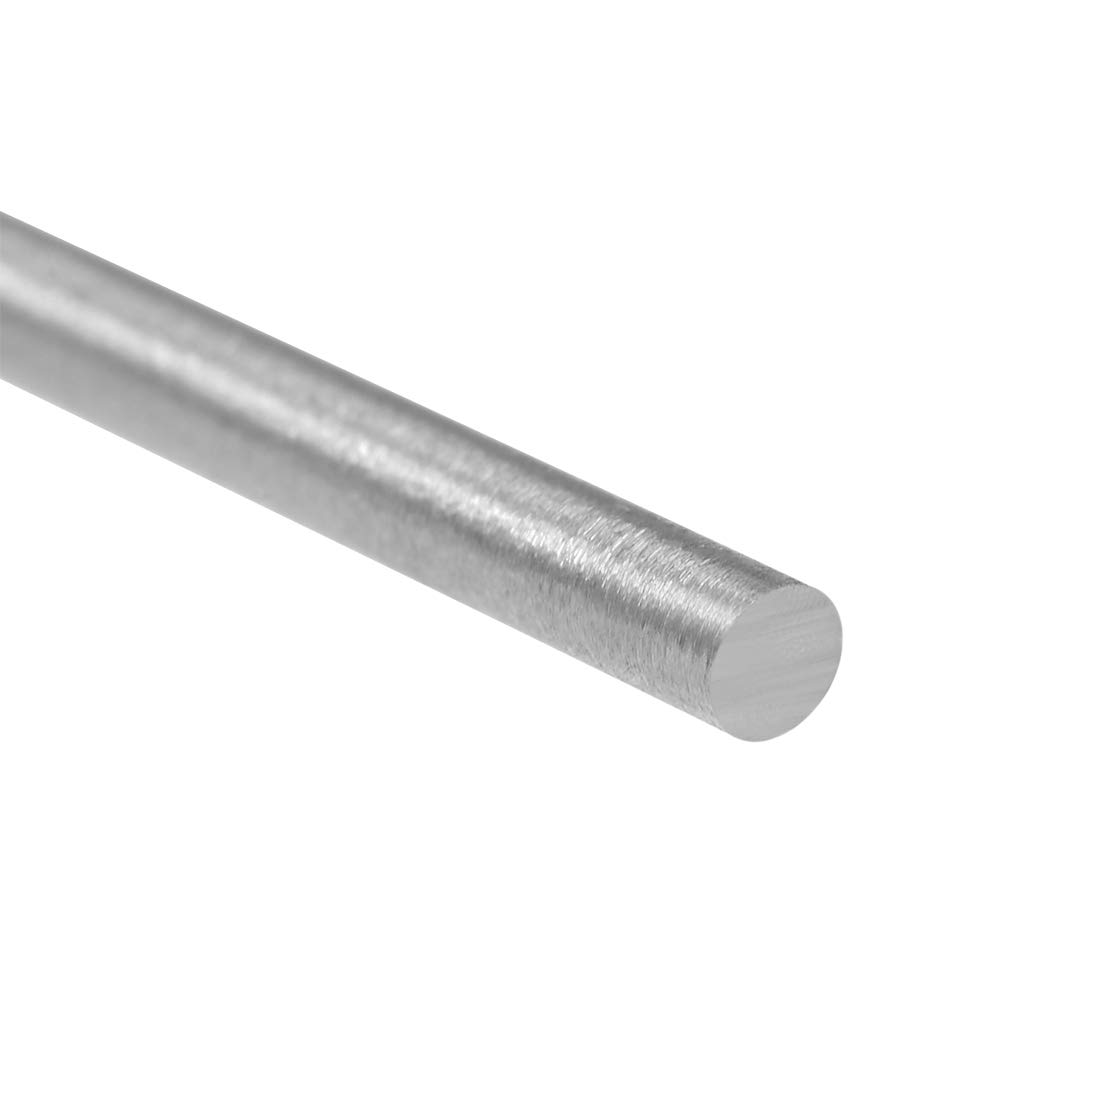 for Shaft Miniature Axle DIY Craft Tool 20 Pcs uxcell Round Rod 1.2mm Diameter 100mm Length HSS Lathe Bar Stock